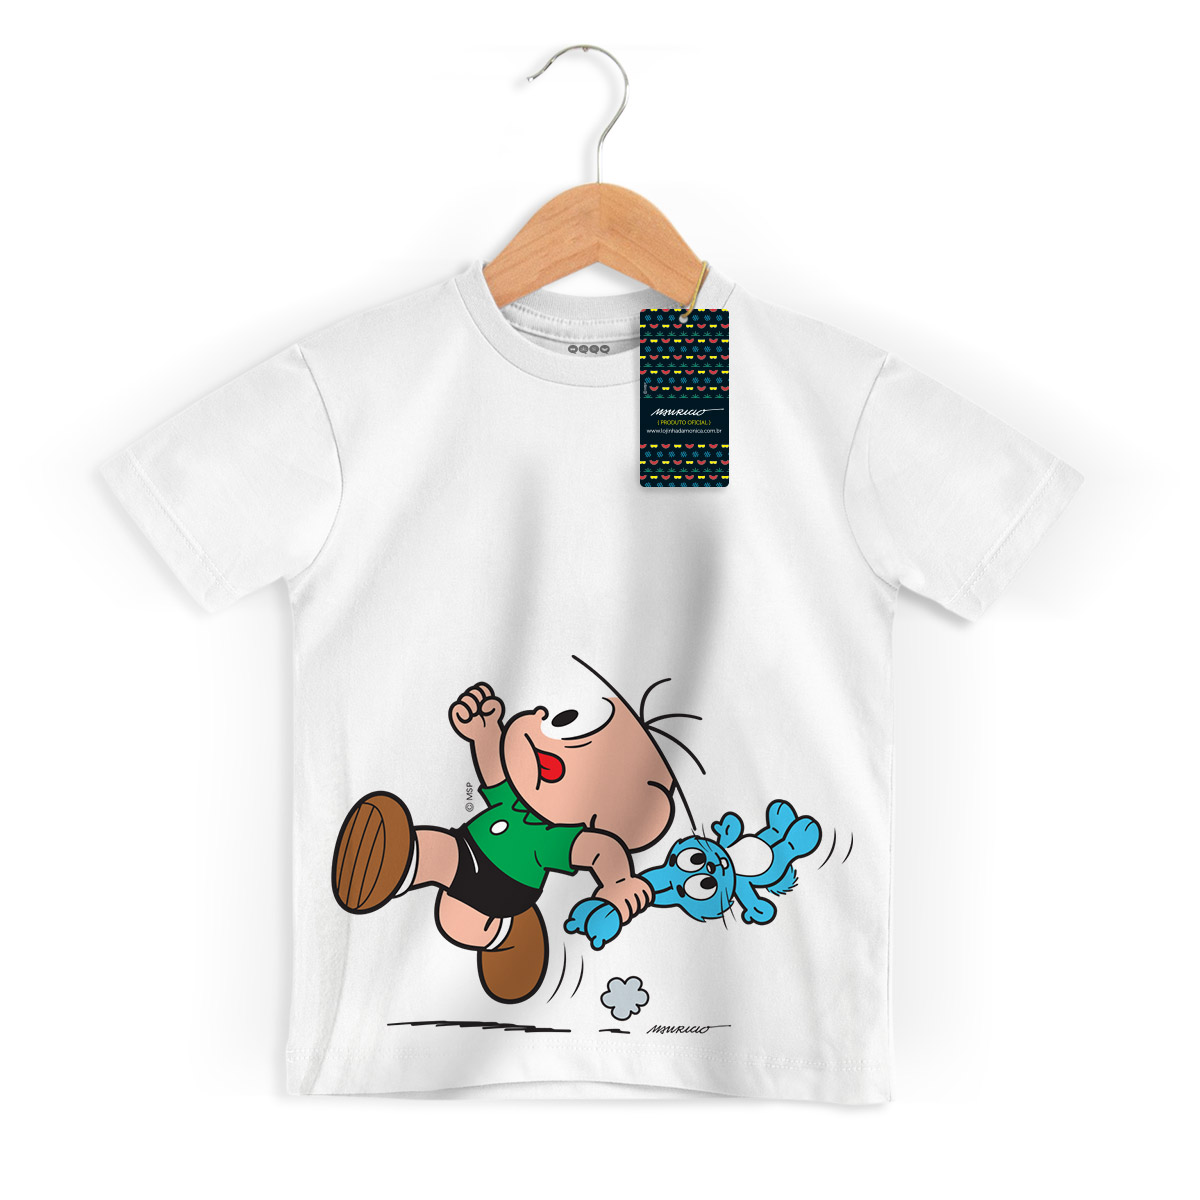 Camiseta Infantil Turma da Mônica Kids Cebolinha Fugindo